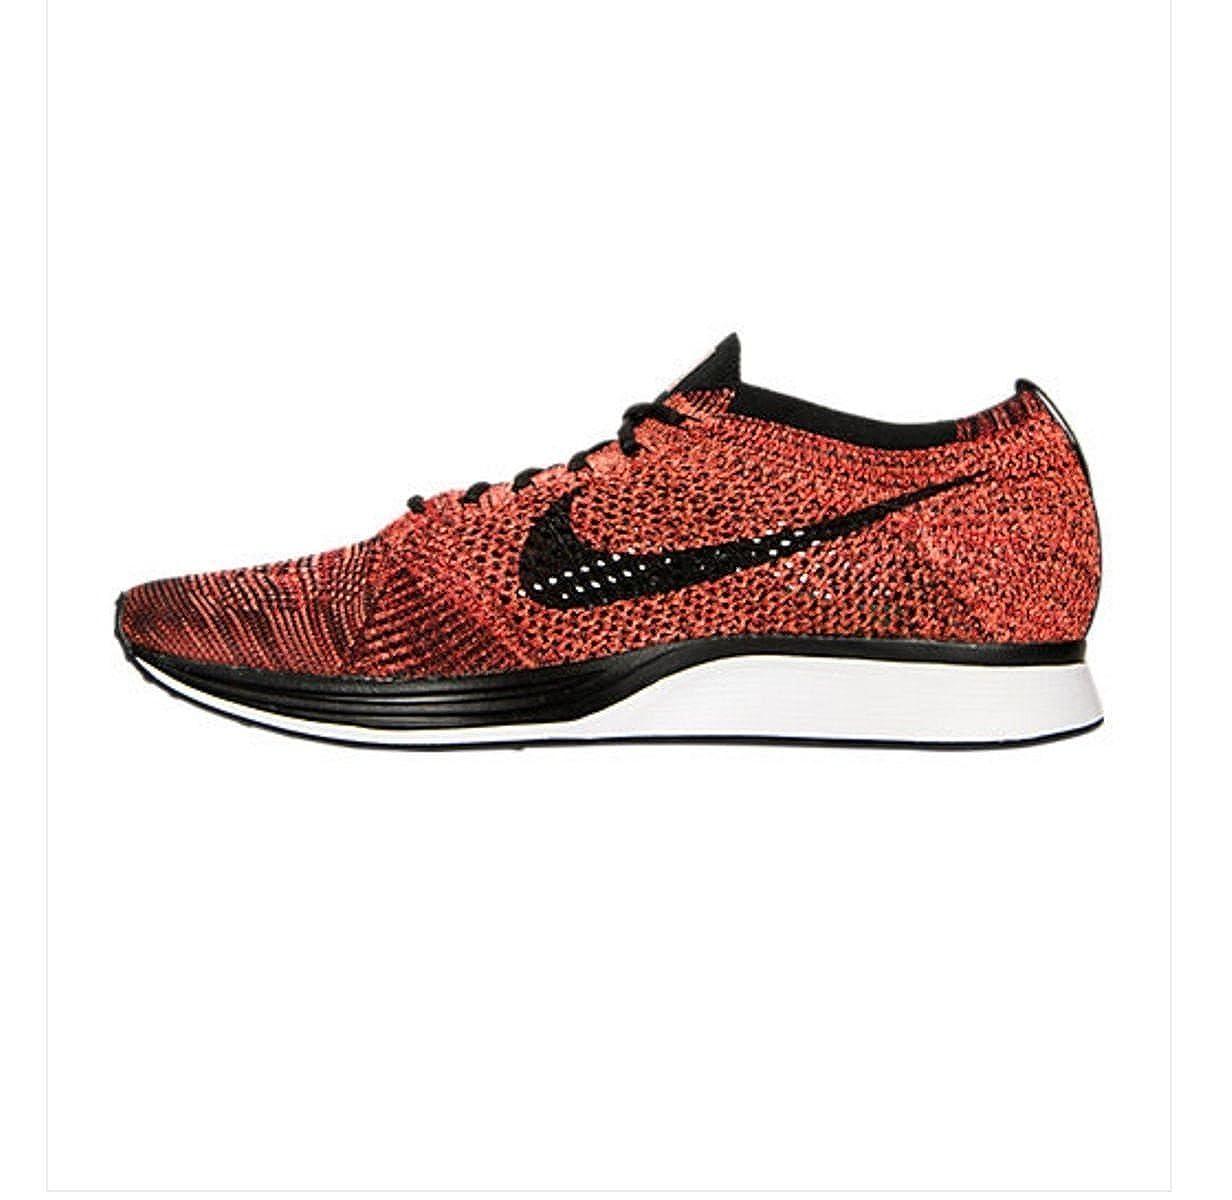 faaf75e64fc3 Nike Flyknit Racer Running Men s Shoes Size 8  Amazon.ca  Shoes   Handbags